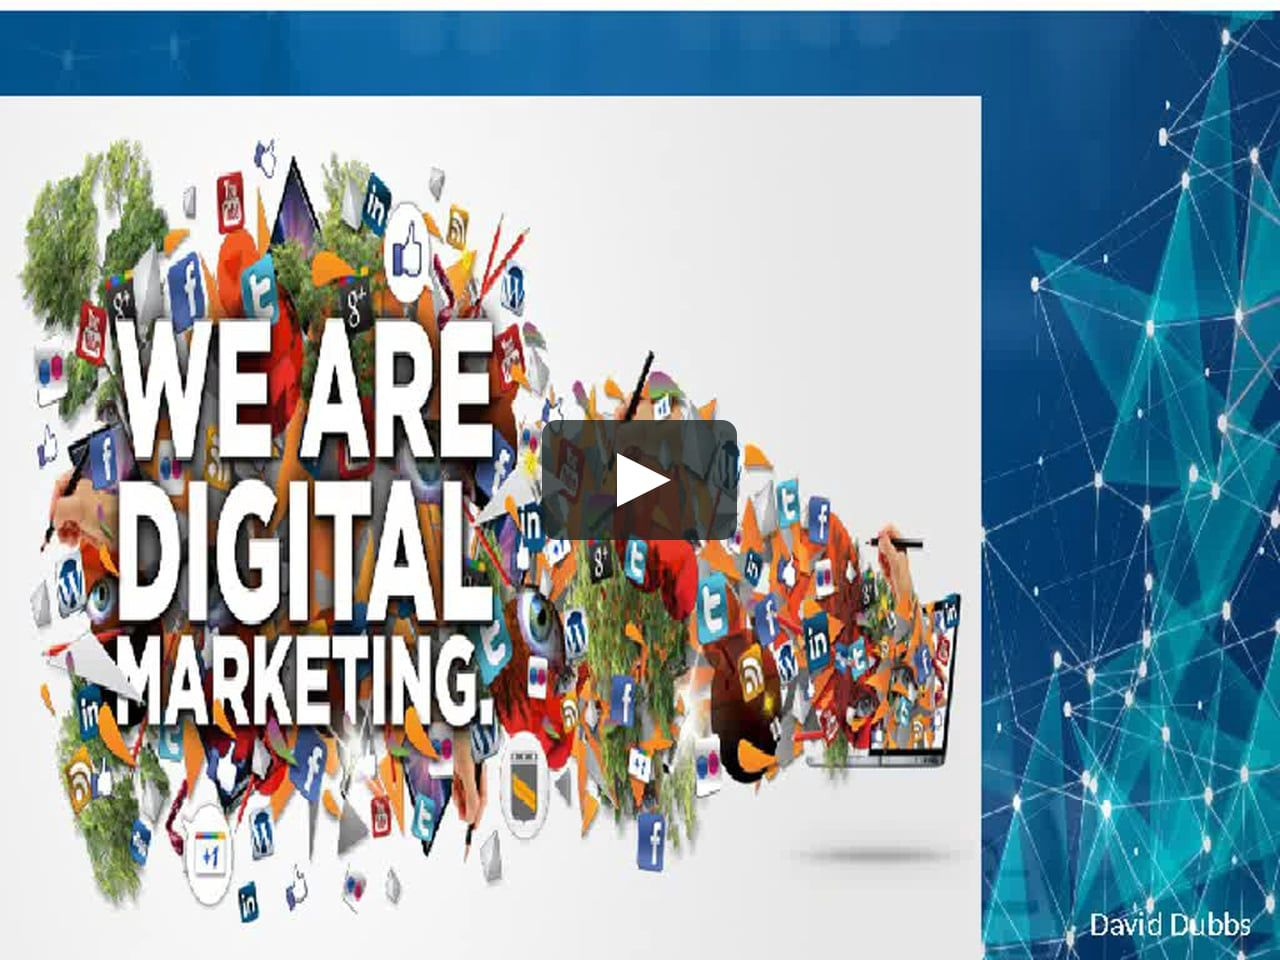 David Dubbs Why is Digital Marketing so Trending